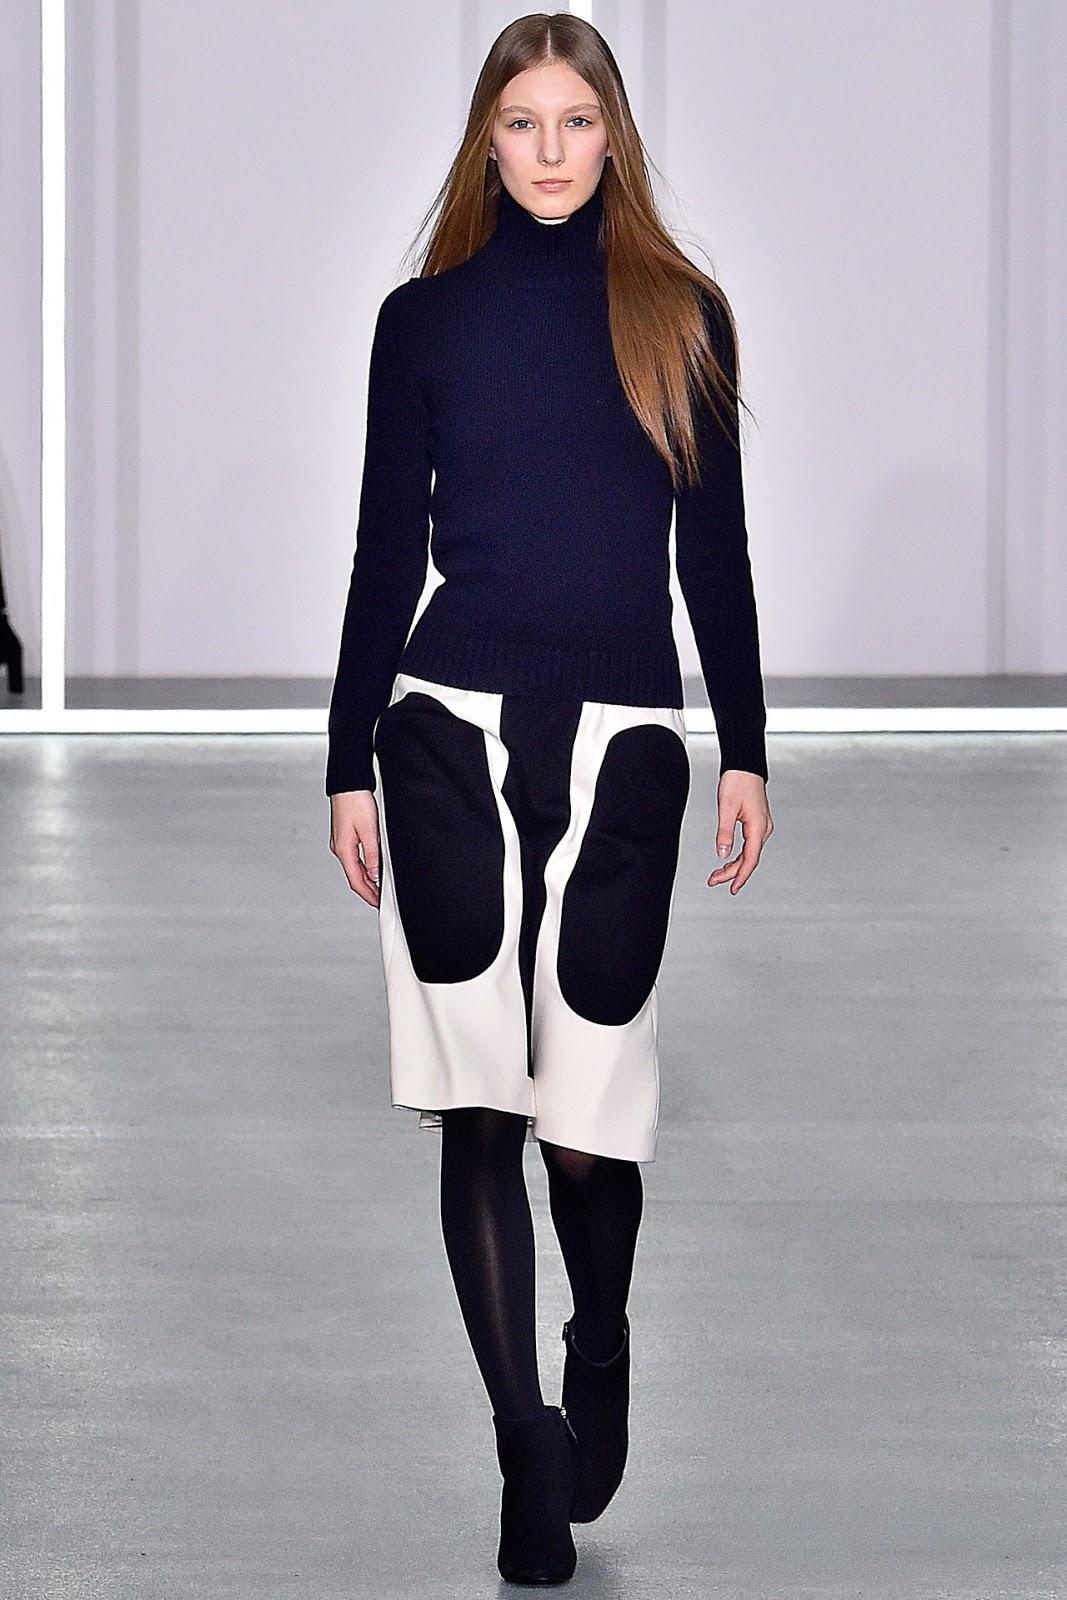 Jasper Conran Fall/Winter 2016 collection via www.fashionedbylove.co.uk / London fashion week, LFW 2016